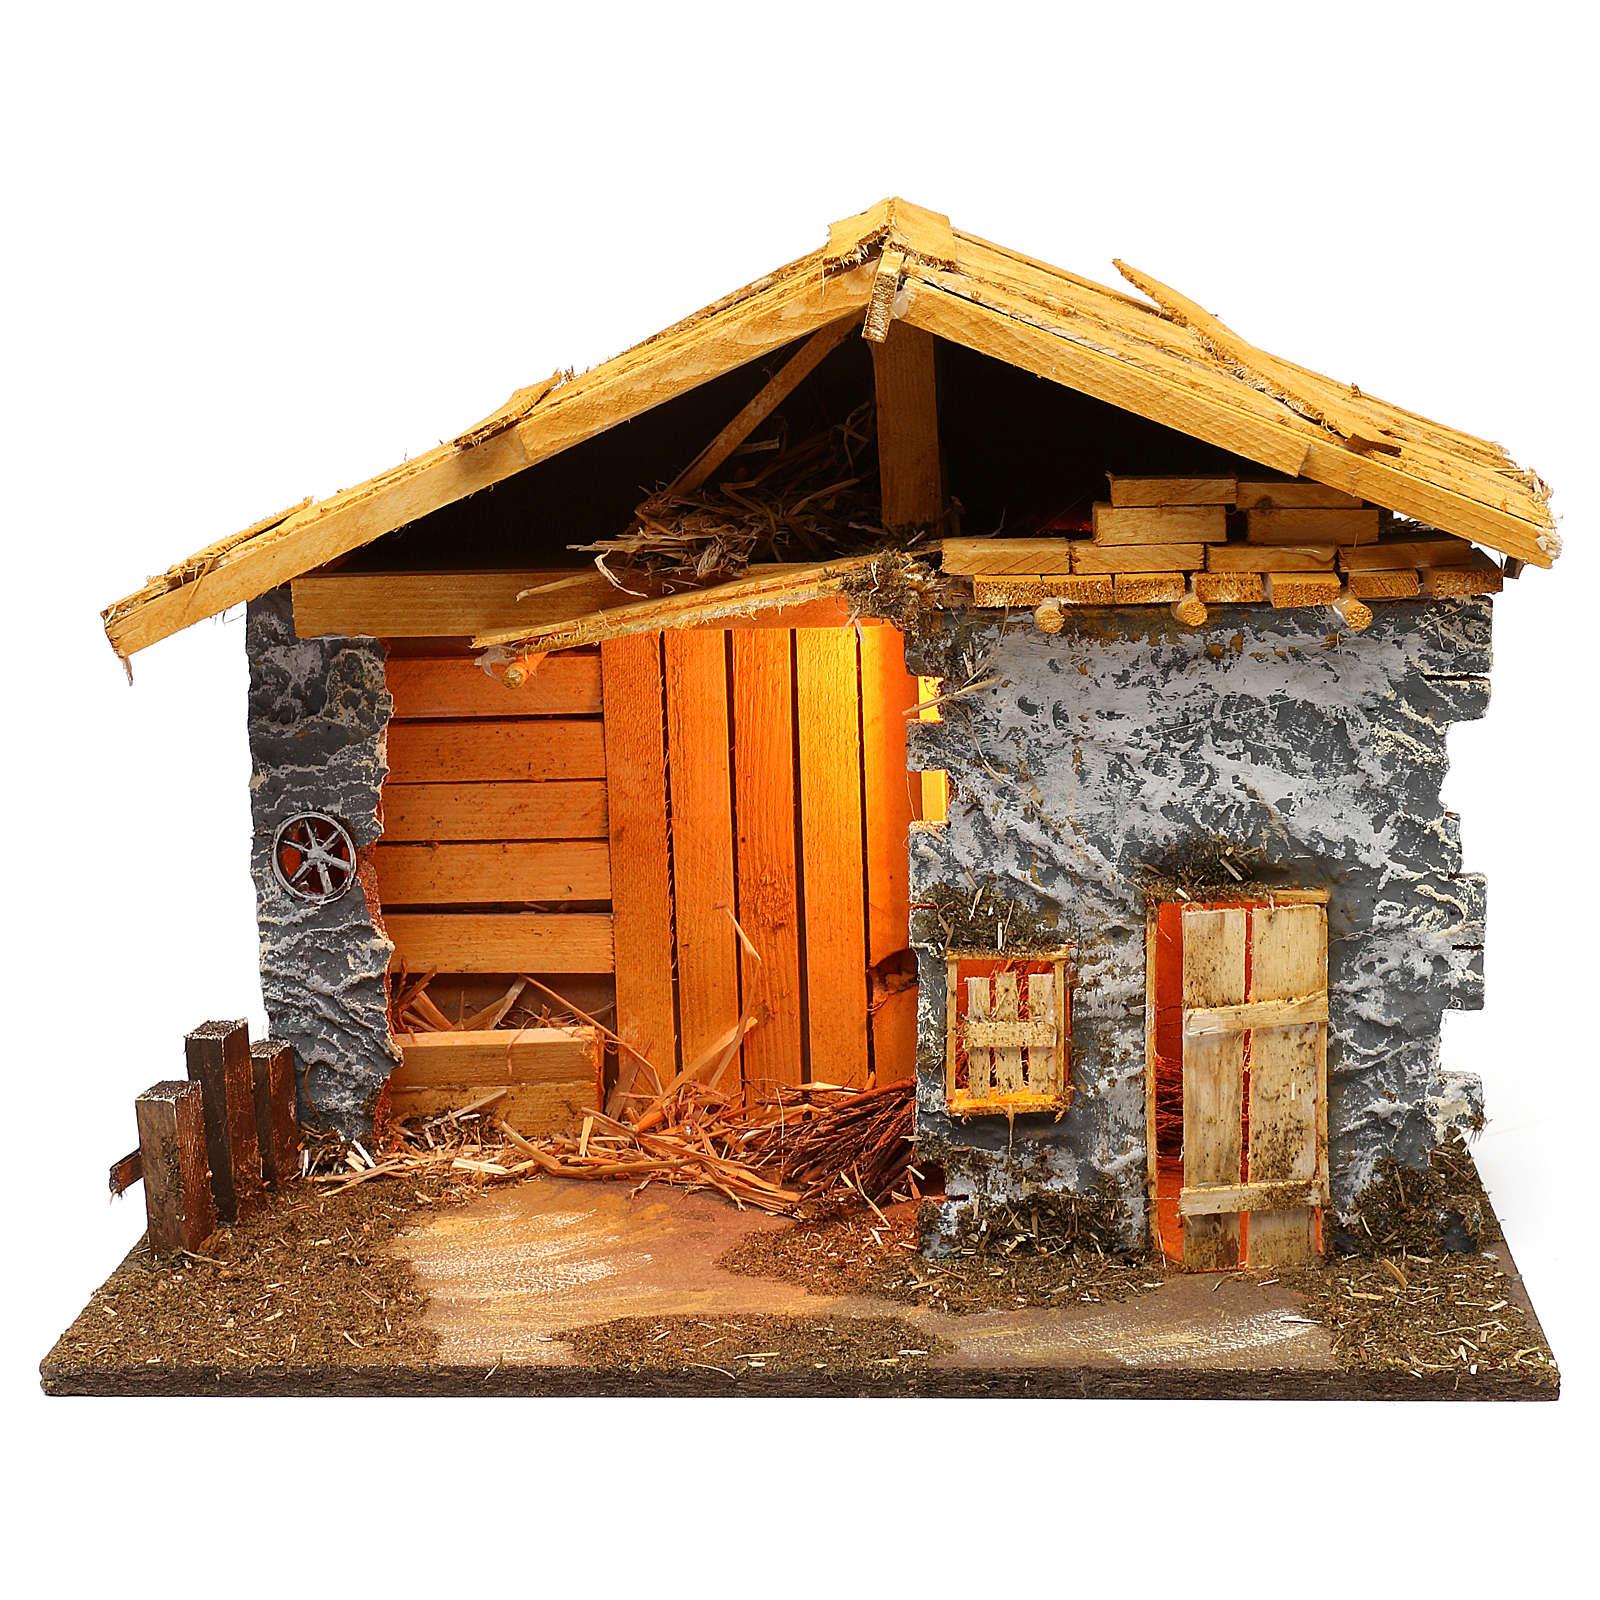 Nordic style hut with masonry barn 40x50x25 cm for Nativity scenes of 12 cm 4